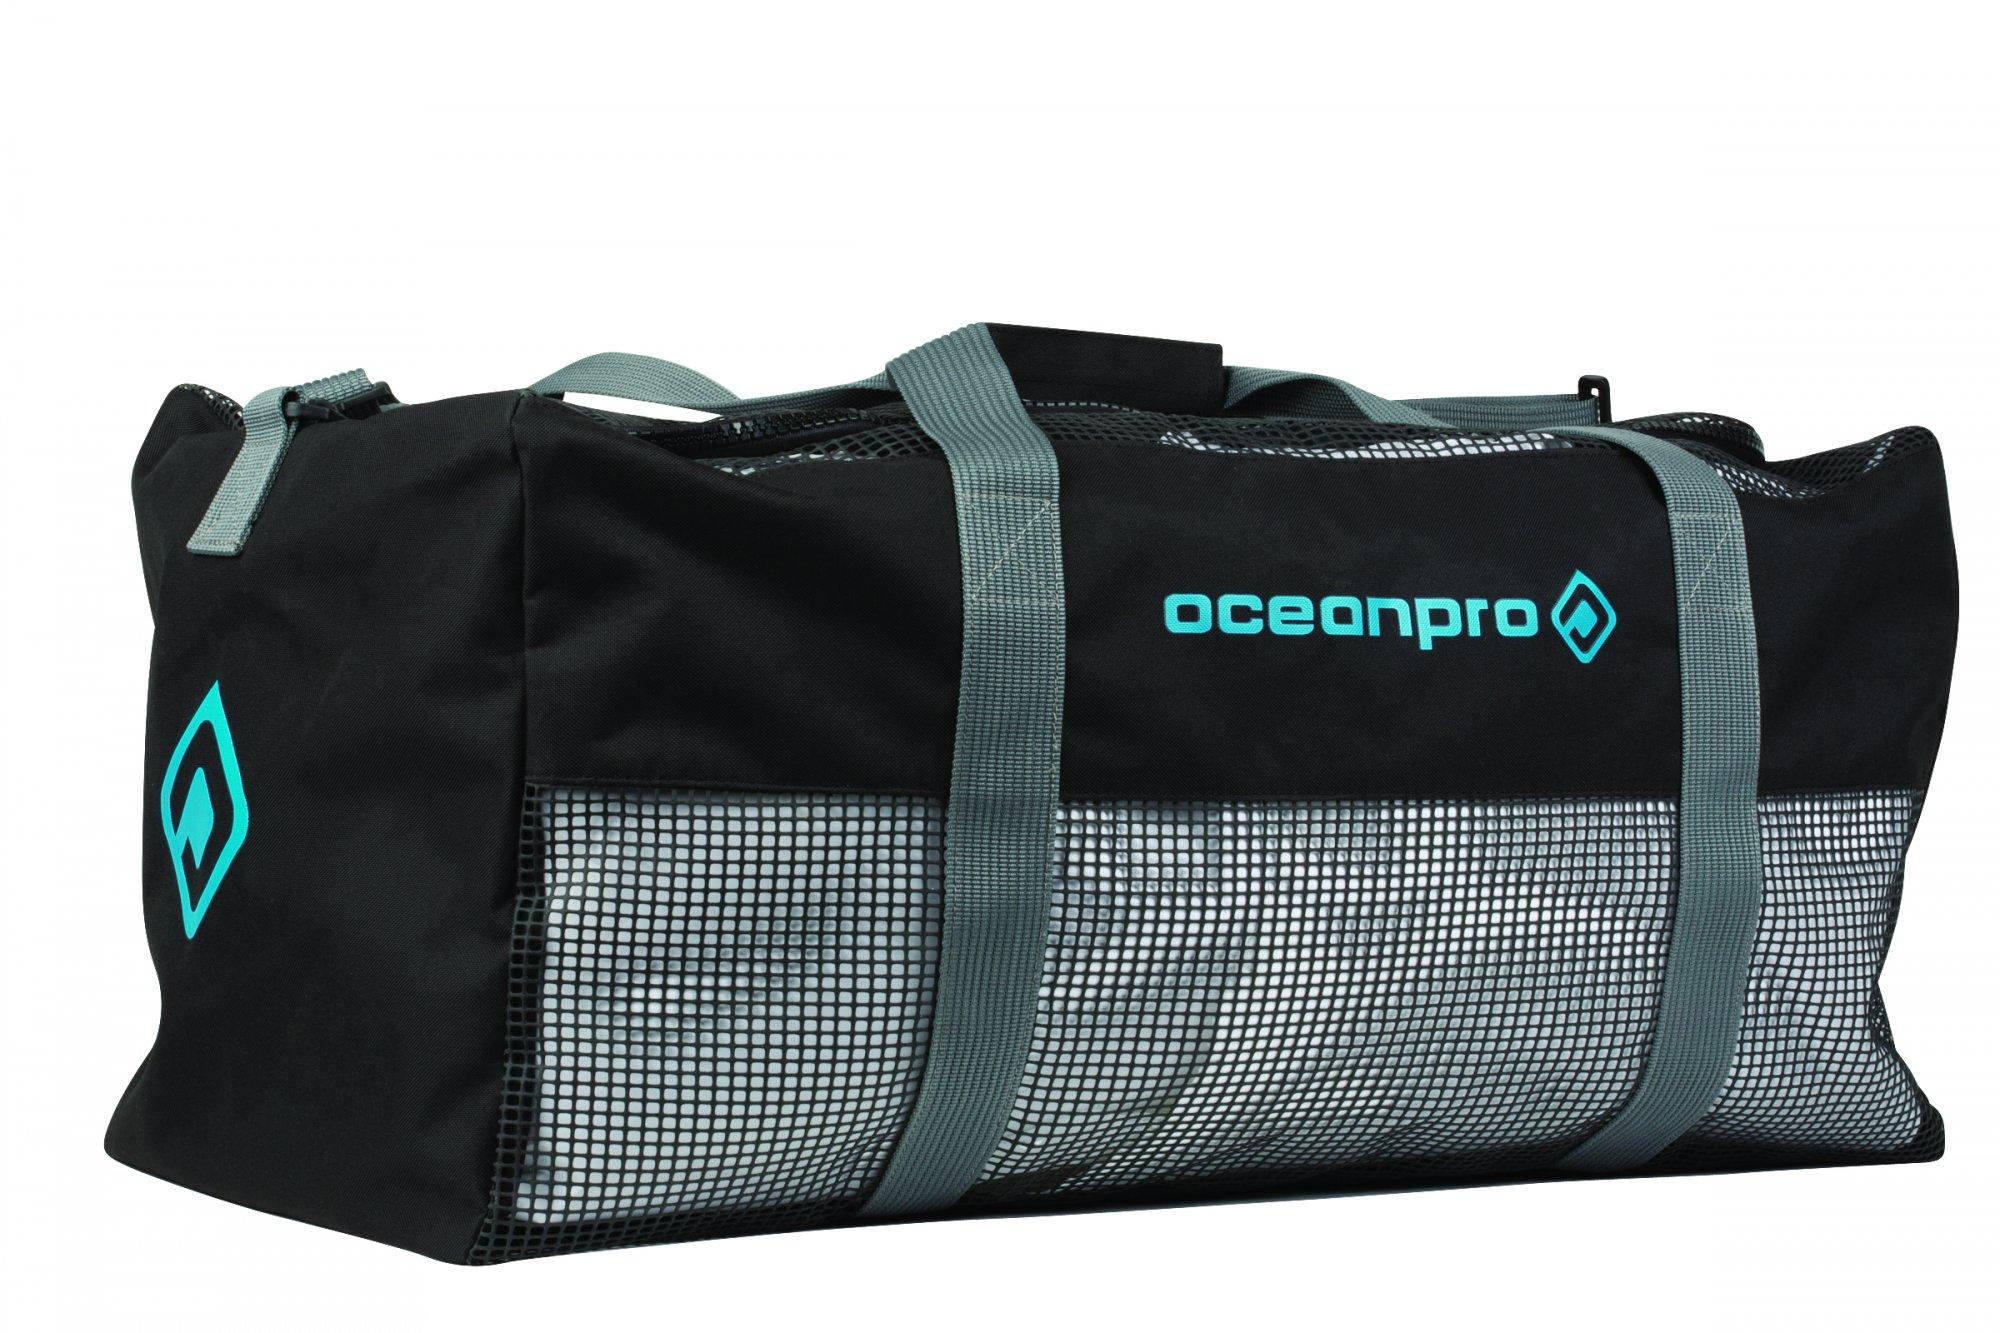 Oceanpro Mesh Duffle Bag